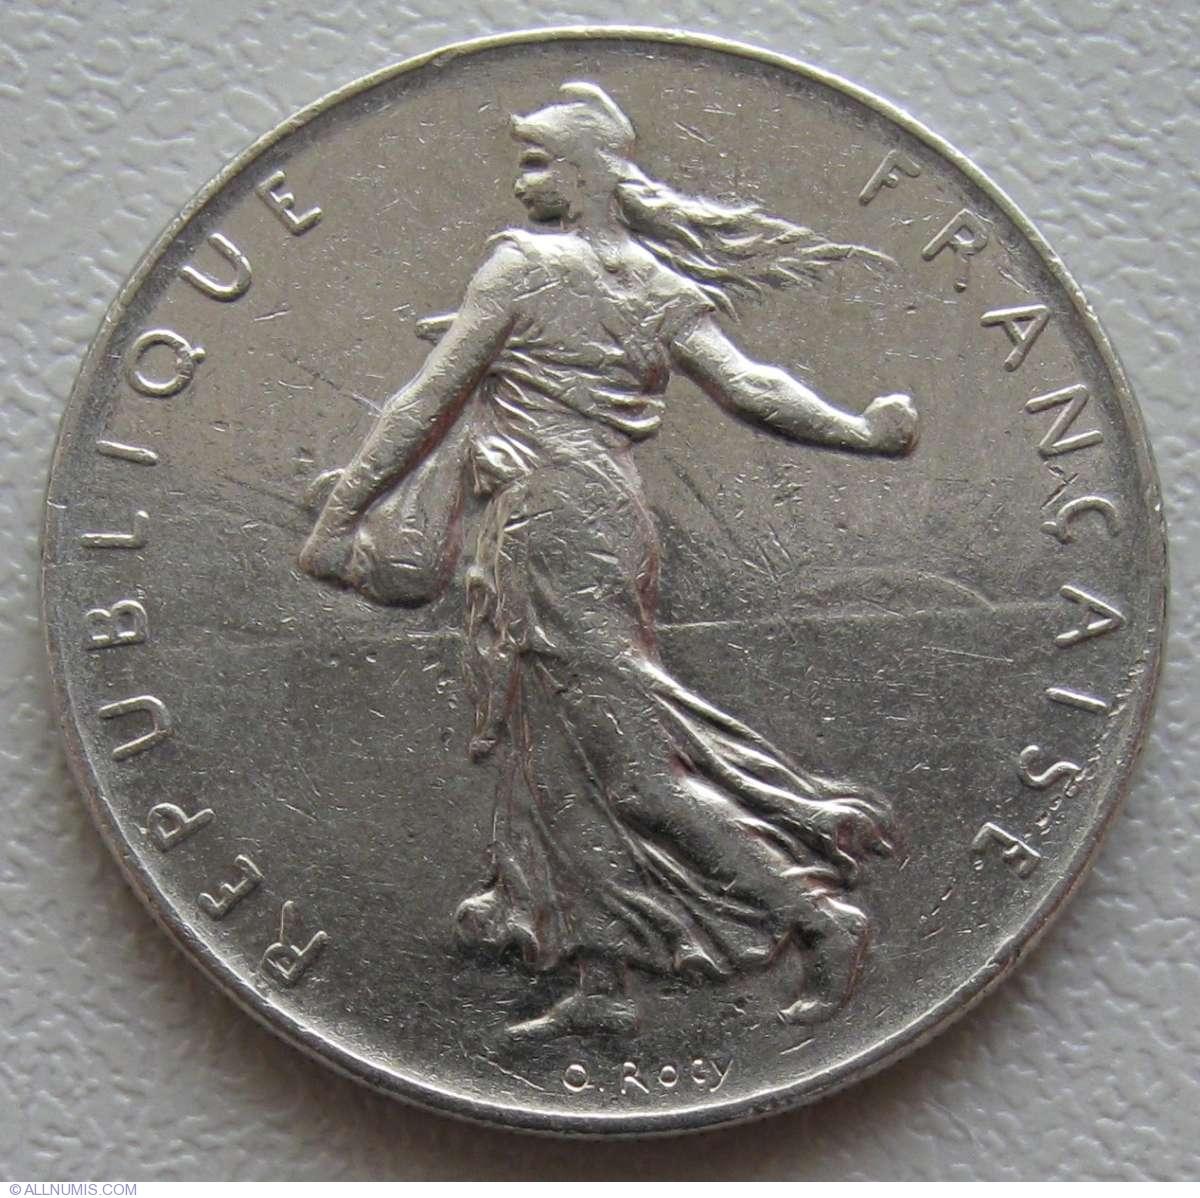 franc coin worth